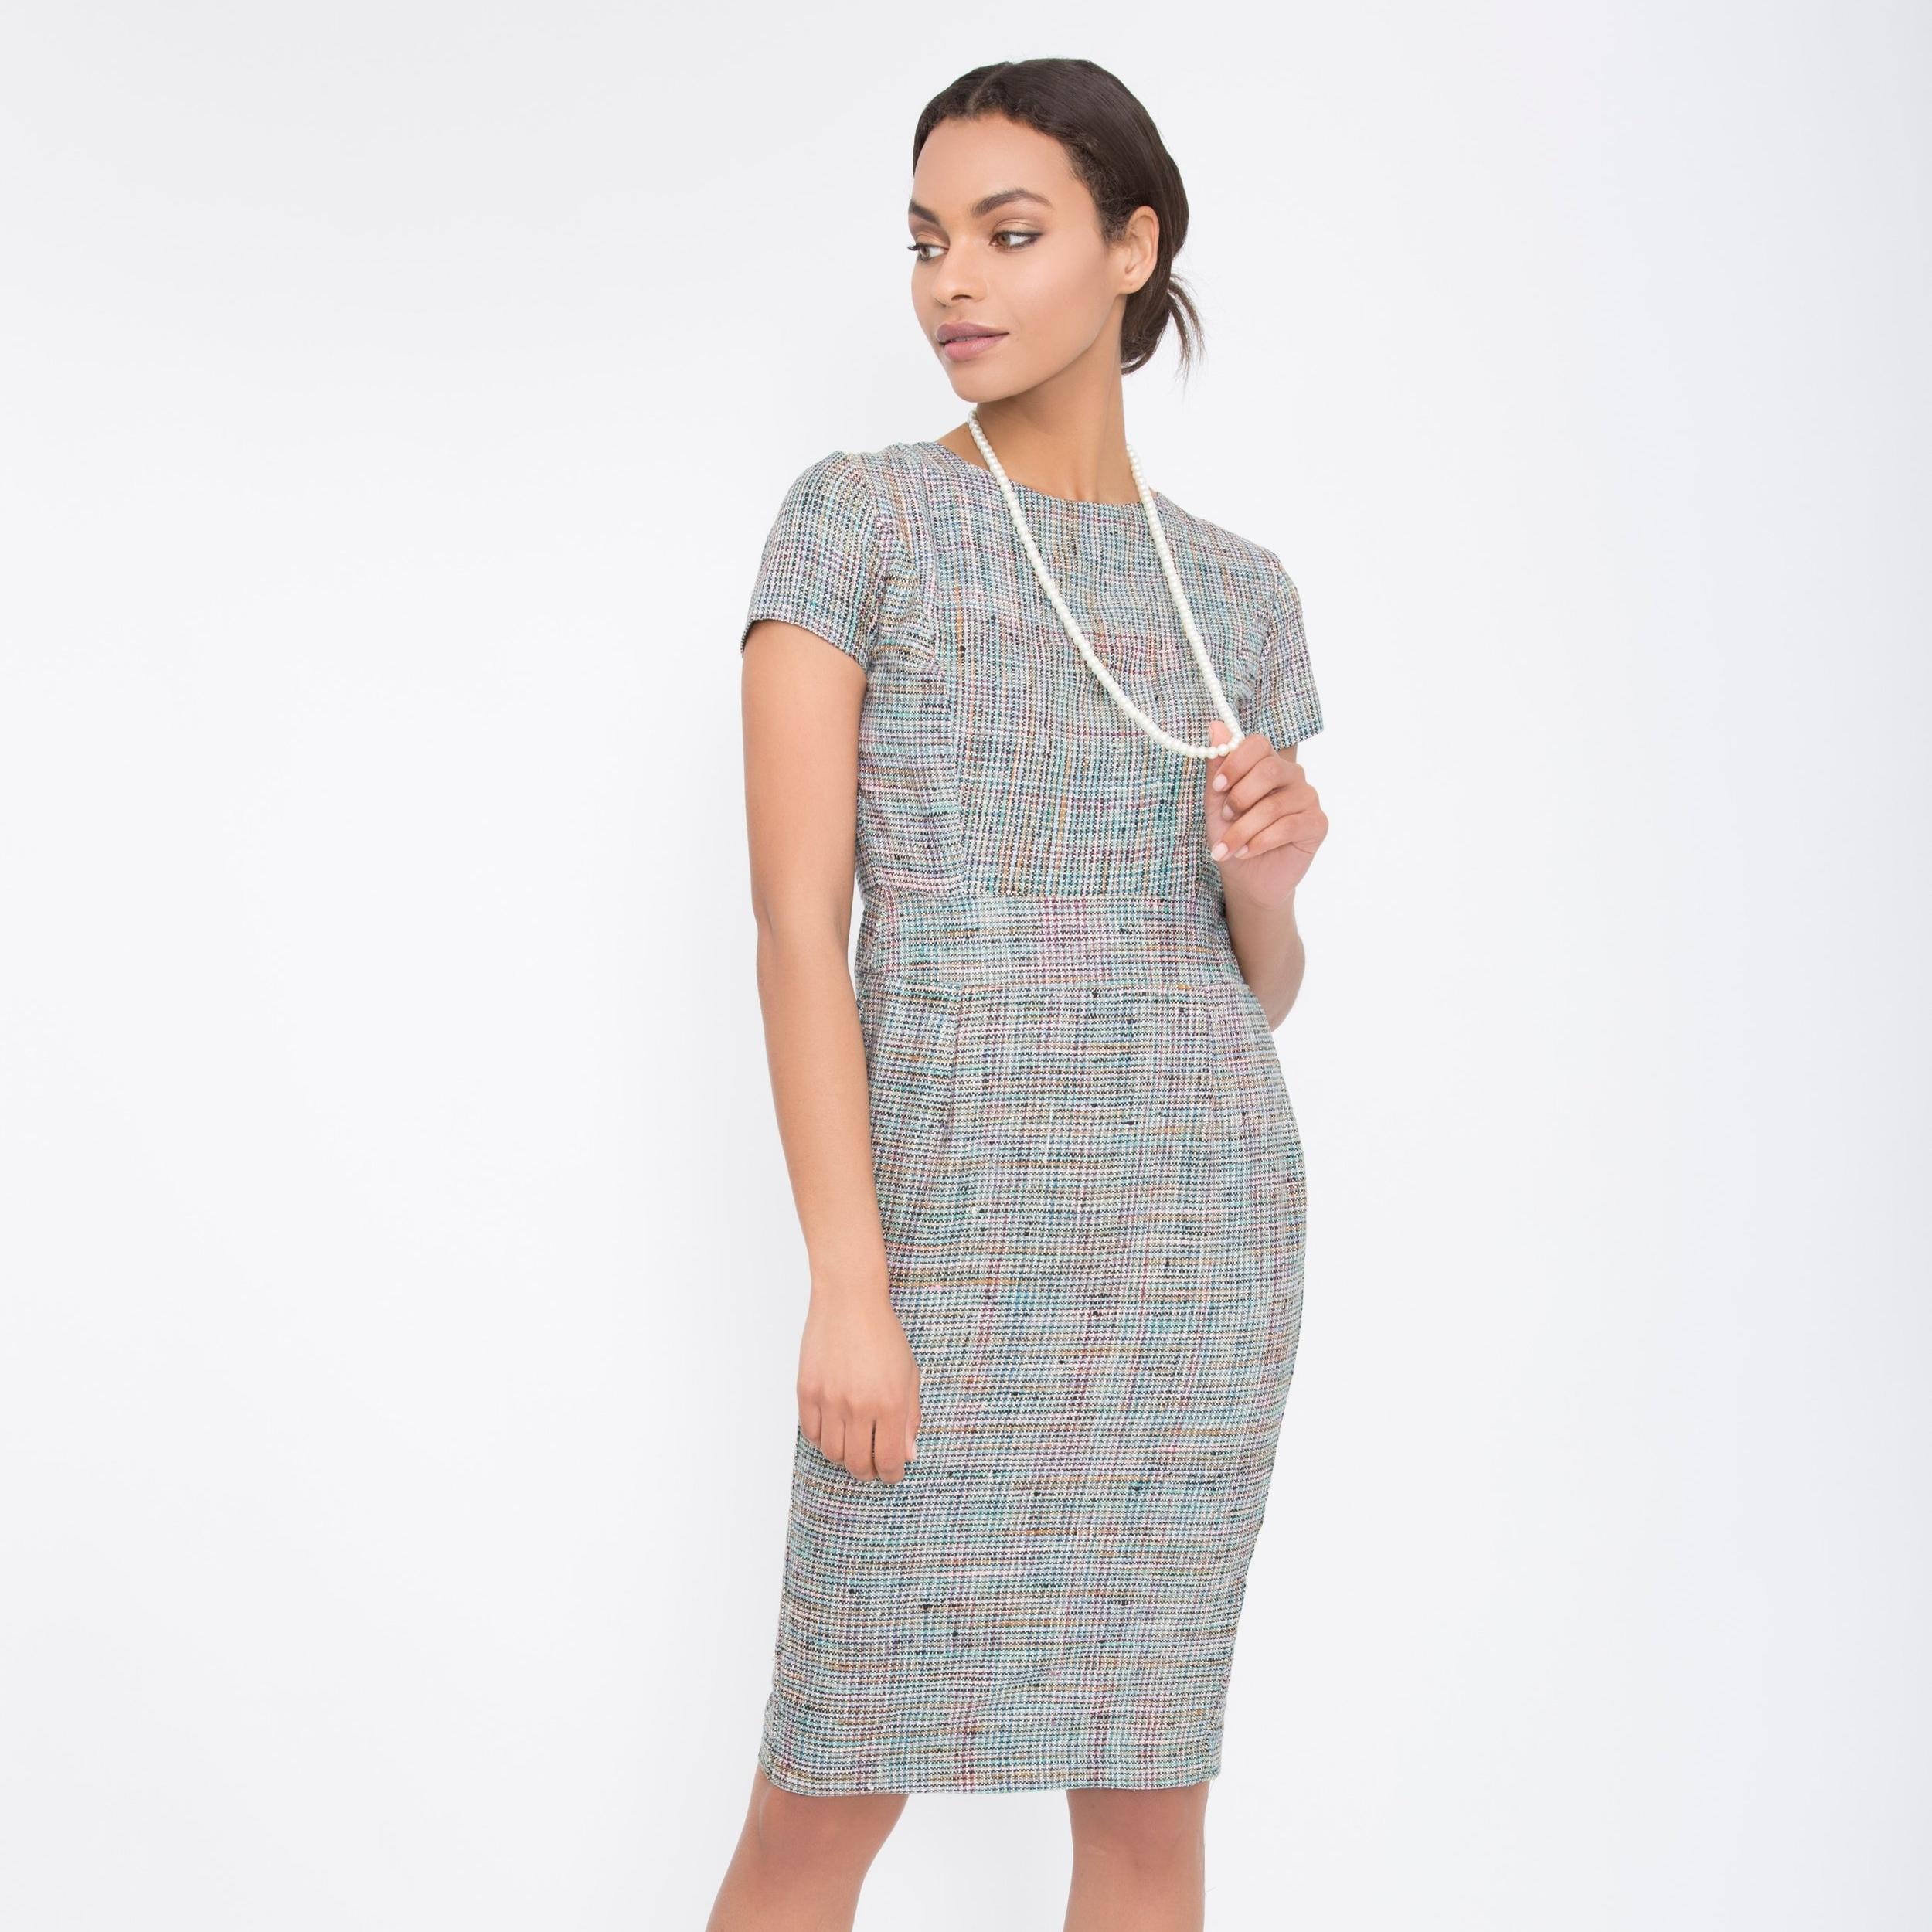 Women's fashionable work dress